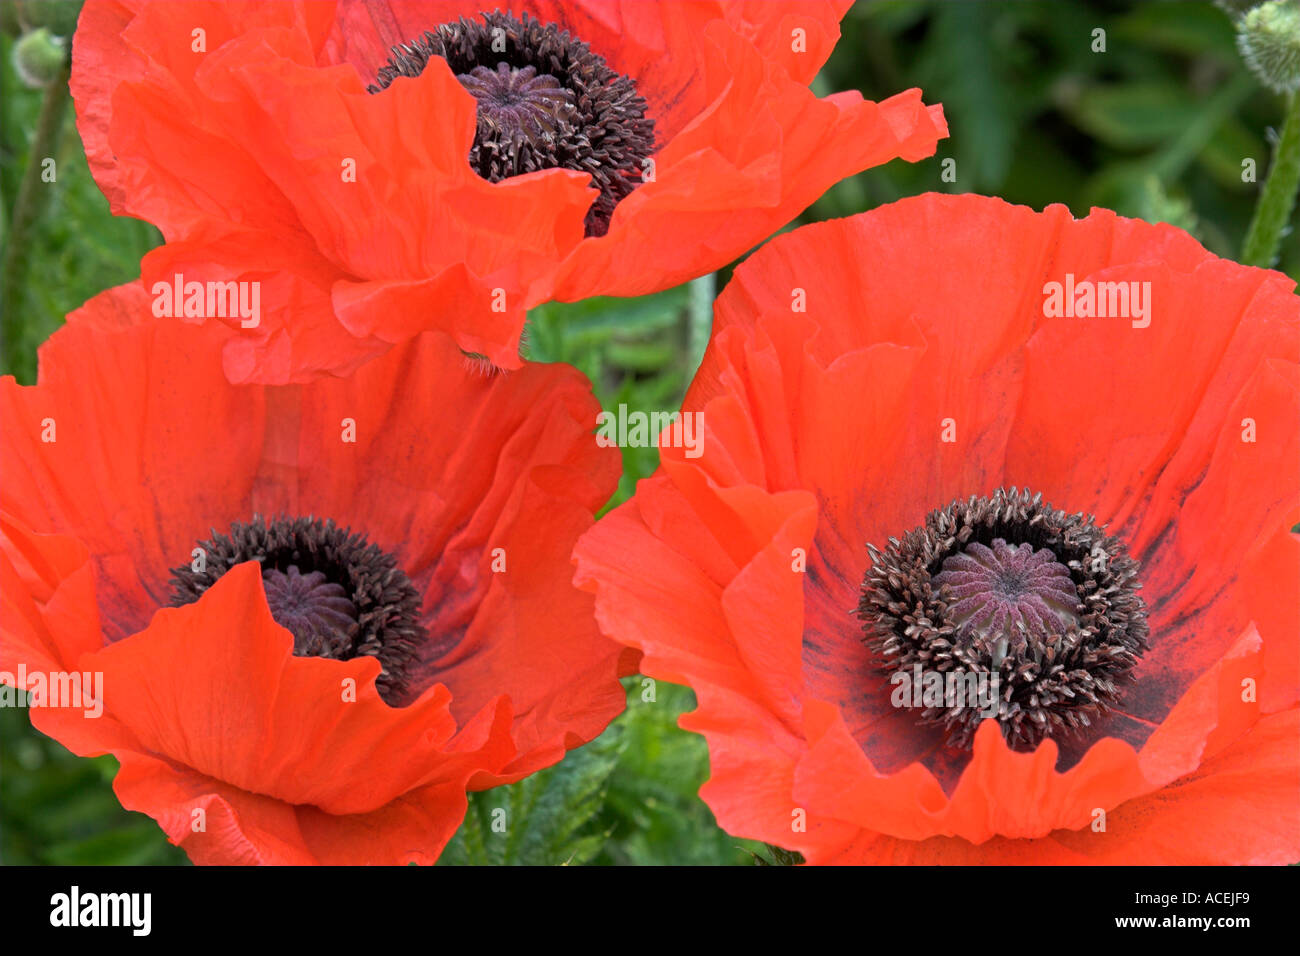 red flowers of oriental poppy botanical name papaver orientale